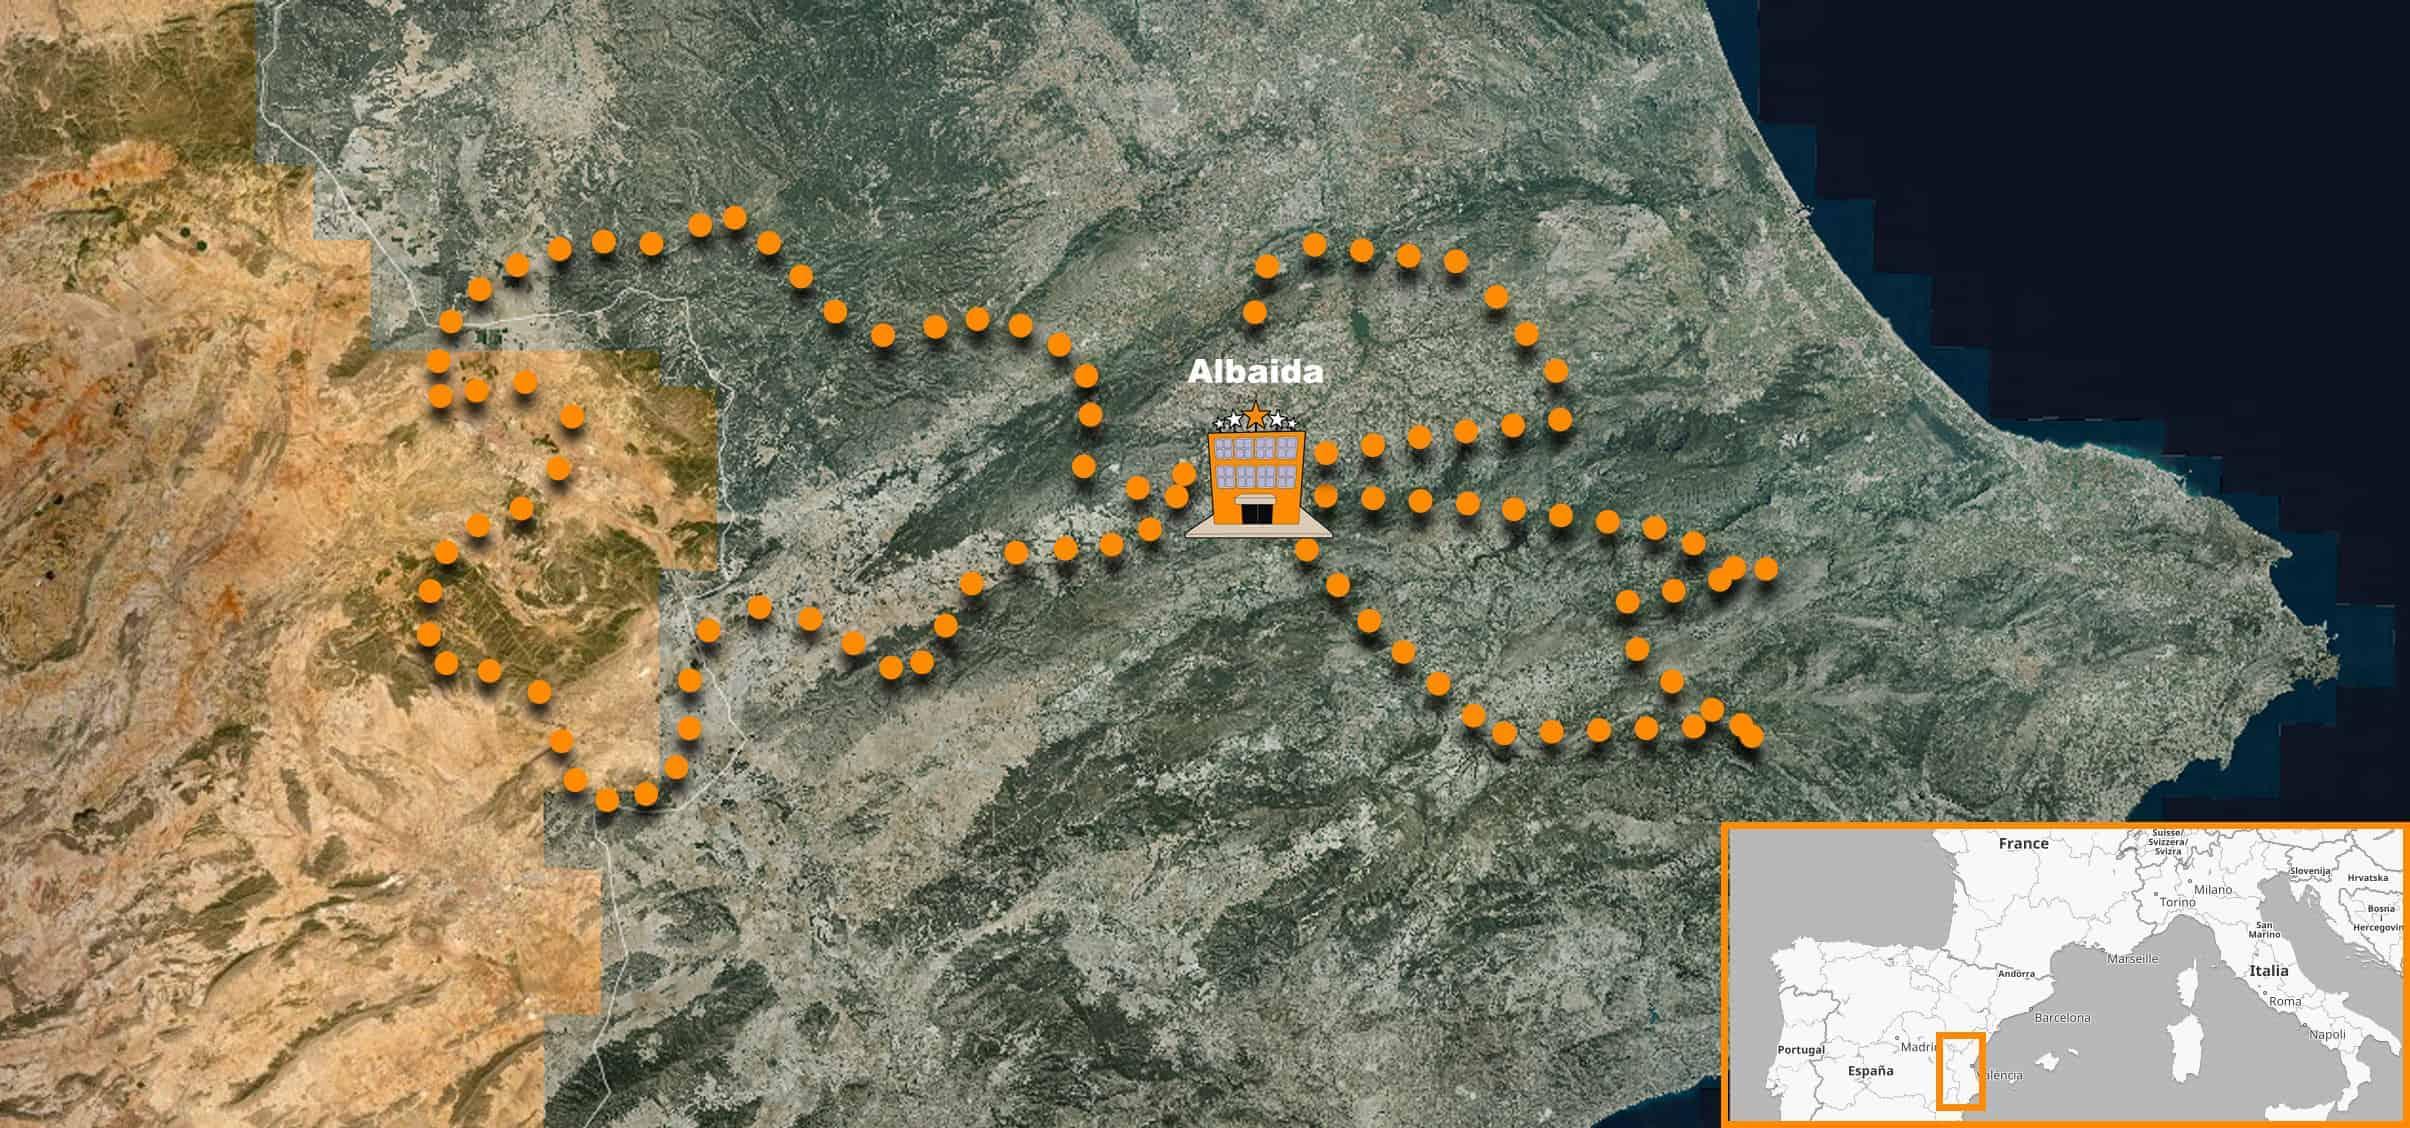 Viaje Organizado en moto por España 100% Offroad itinerario